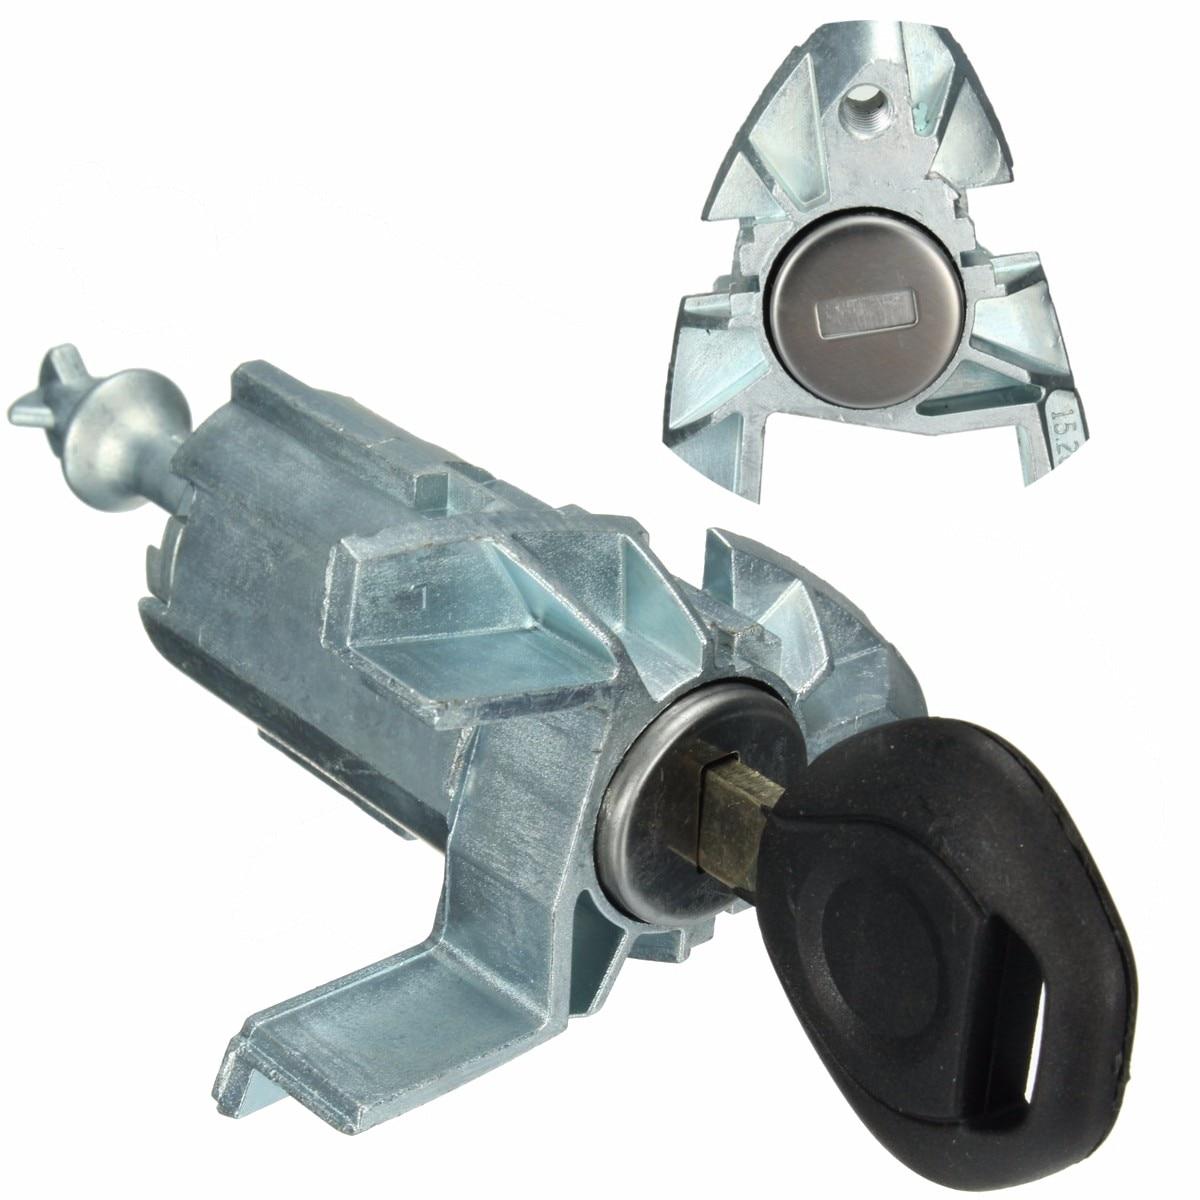 For BMW X5 E53 51217035421 Left Driver Door Lock Assembly Key Cylinder Barrel Repair Kit